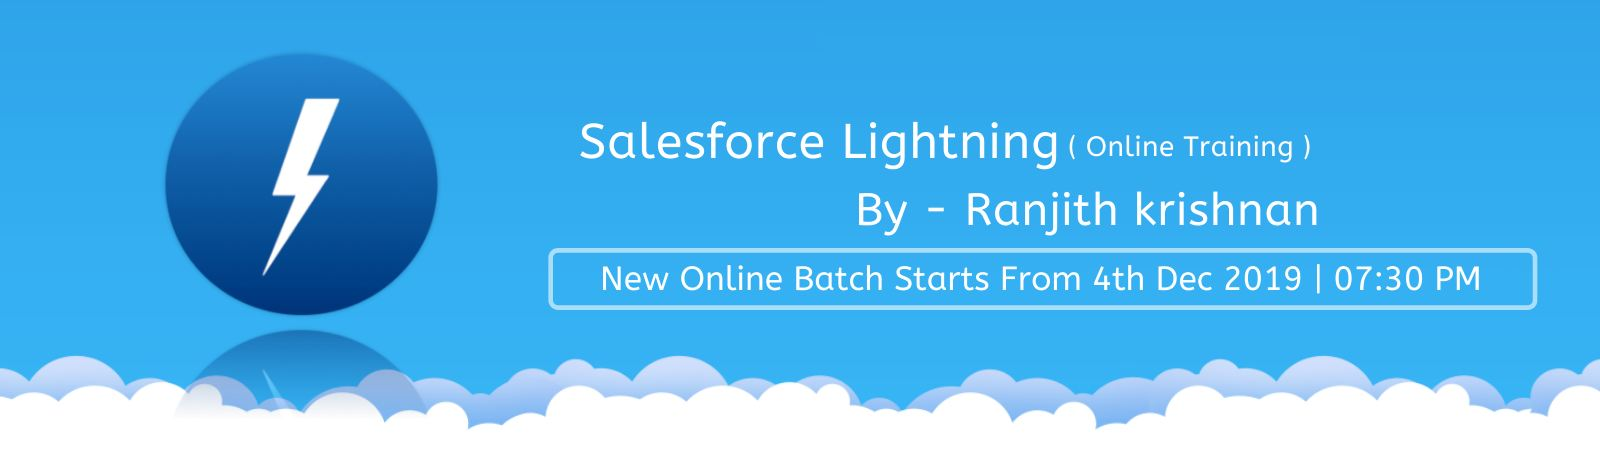 salesforce-lightning